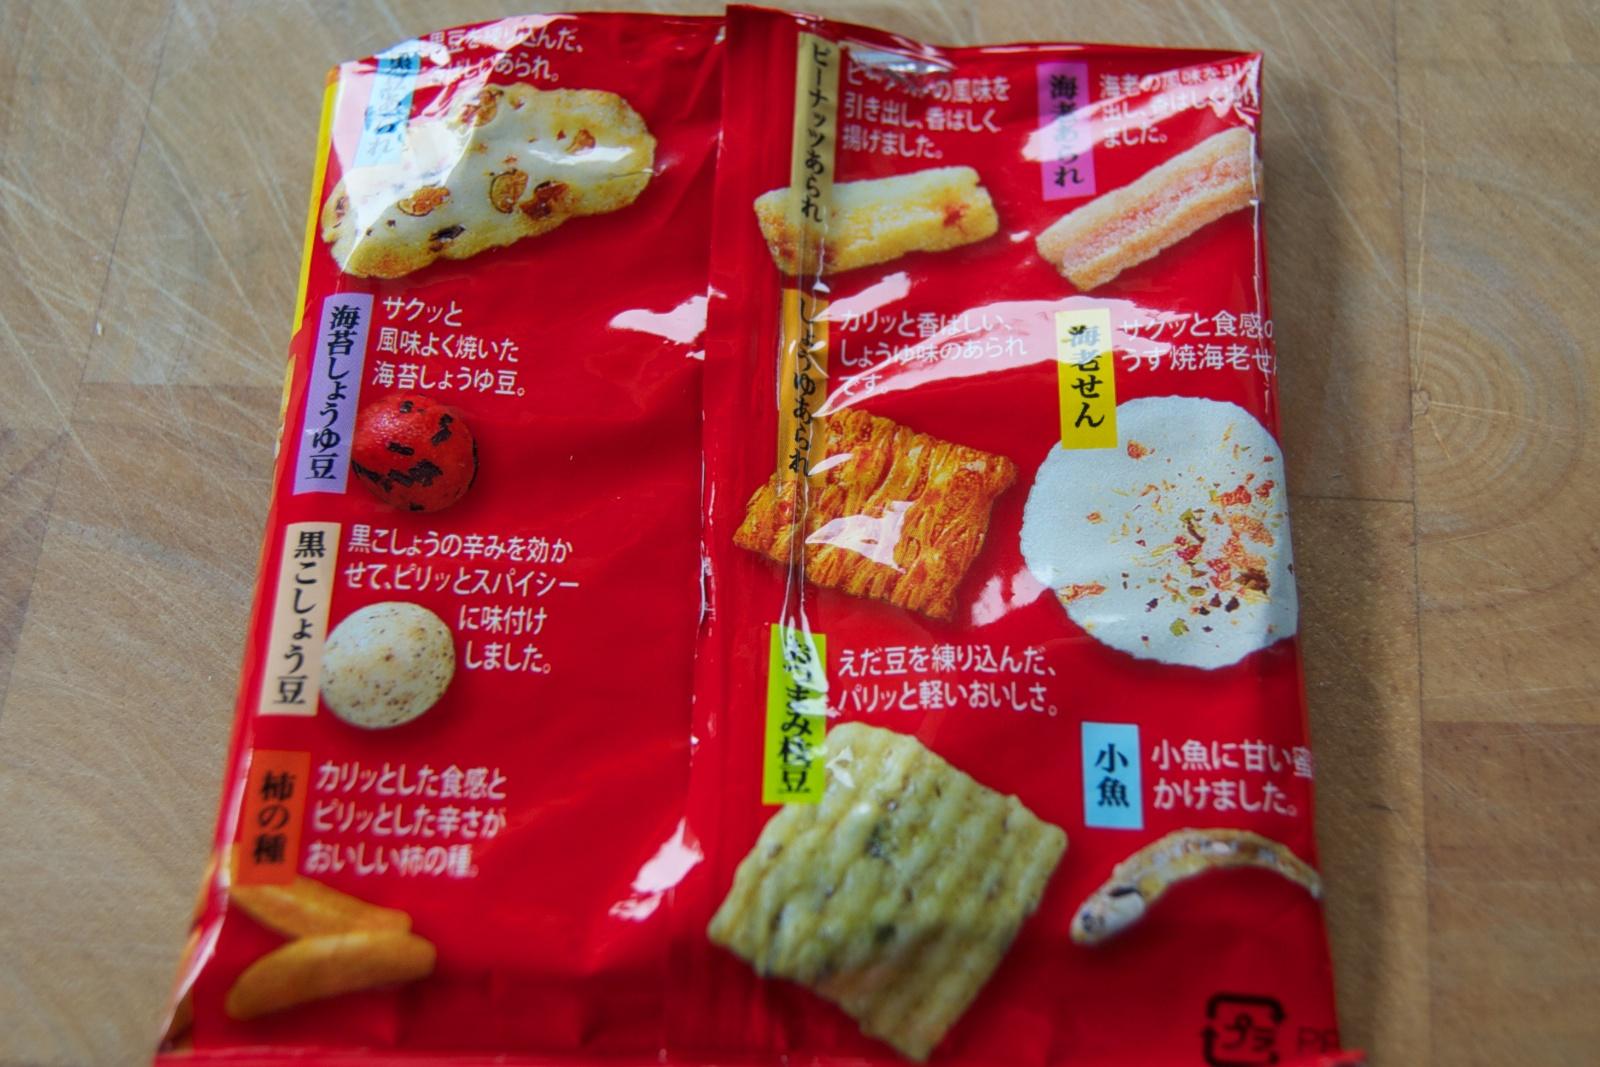 http://blog.rickk.com/food/2014/07/28/ate.2014.07.28.s2.jpg